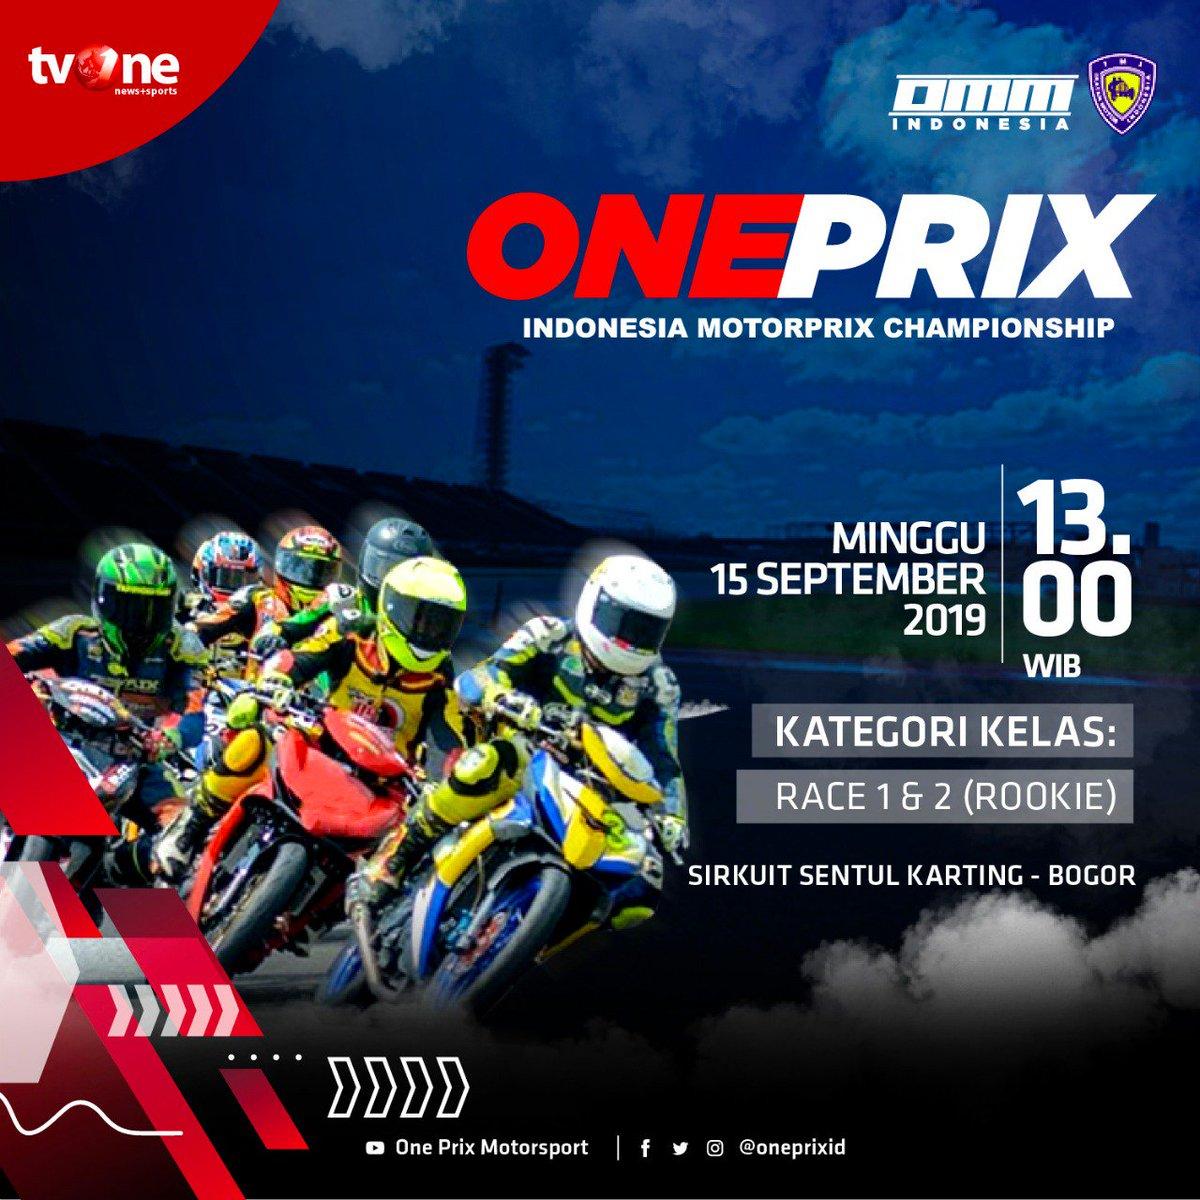 Jangan lewatkan race seru putaran 3 @oneprixid Indonesia Motorprix Championship kelas Rookie. Minggu, 15 September 2019 jam 13.00 WIB hanya di tvOne & streaming di tvOne connect android http://bit.ly/2EMxVdm & ios https://apple.co/2CPK6U3  #Oneprix #OneprixSentul